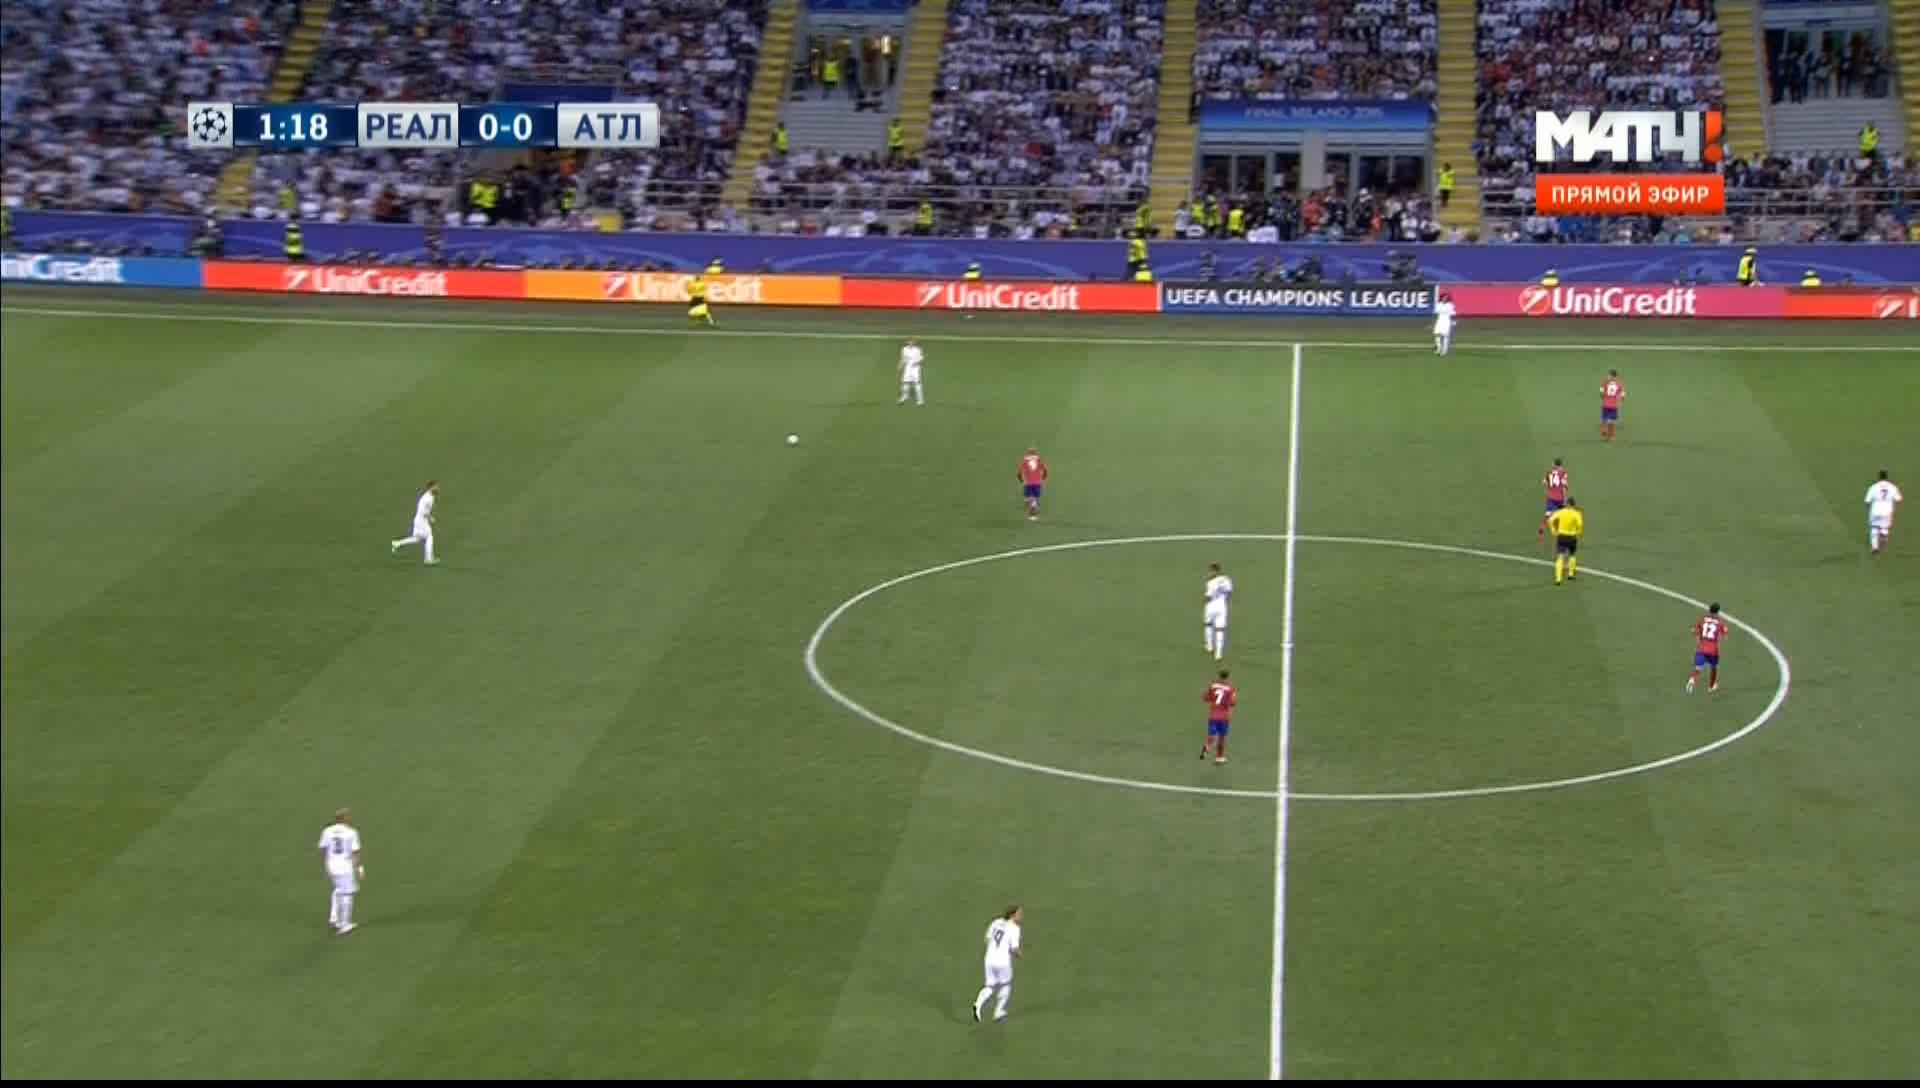 Лига Чемпионов 2015-2016  Финал  Реал Мадрид (Испания) - Атлетико Мадрид (Испания)  Матч ТВ.ts_20160529_035501.281.jpg